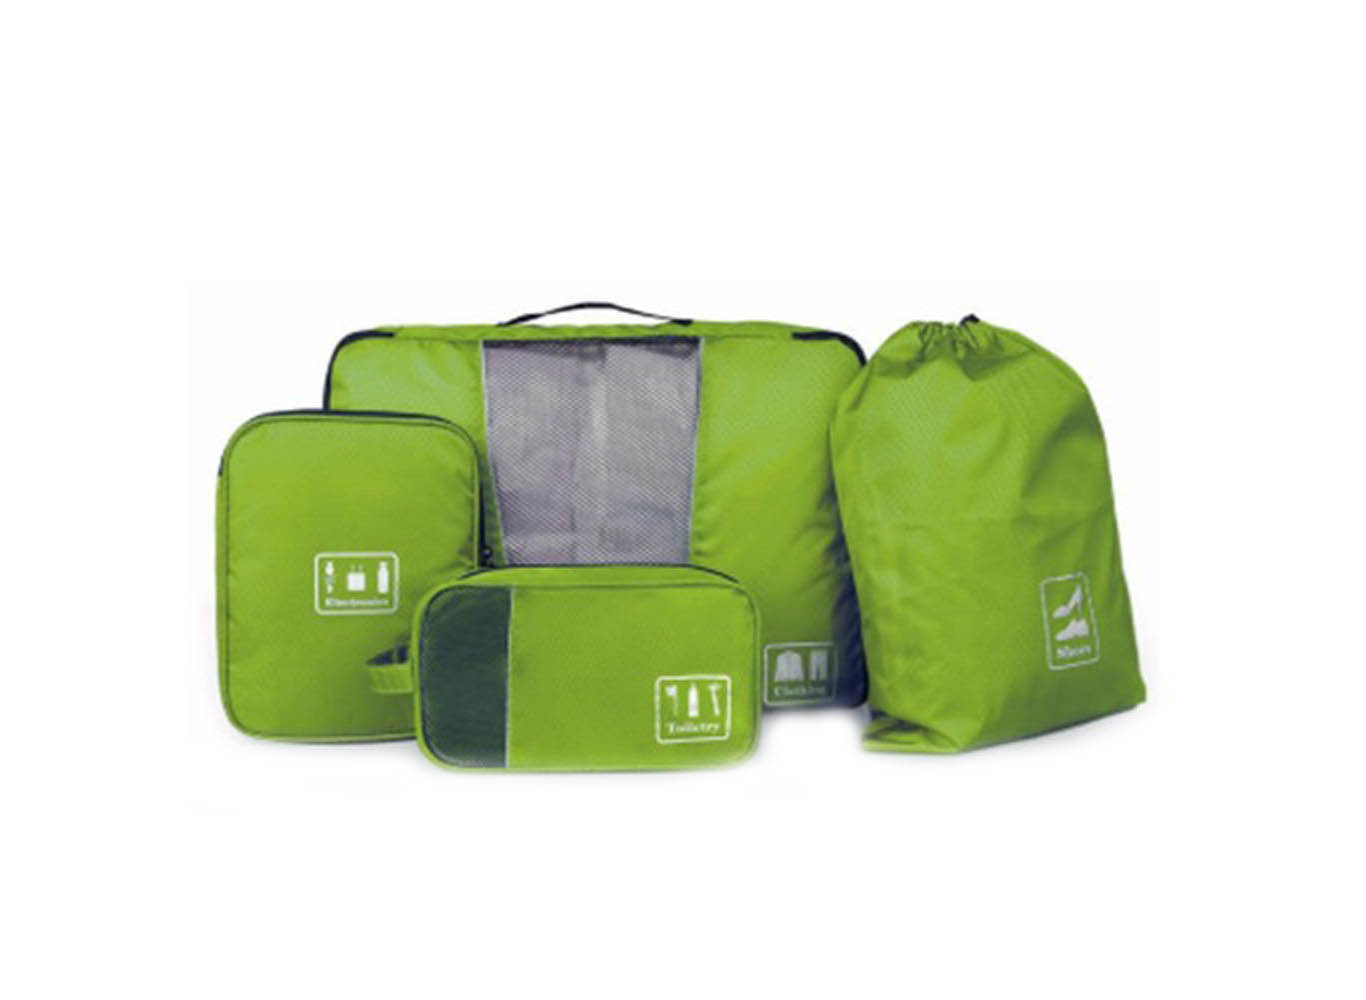 Custom Printed Travel Packing Organizer Clothes Bag